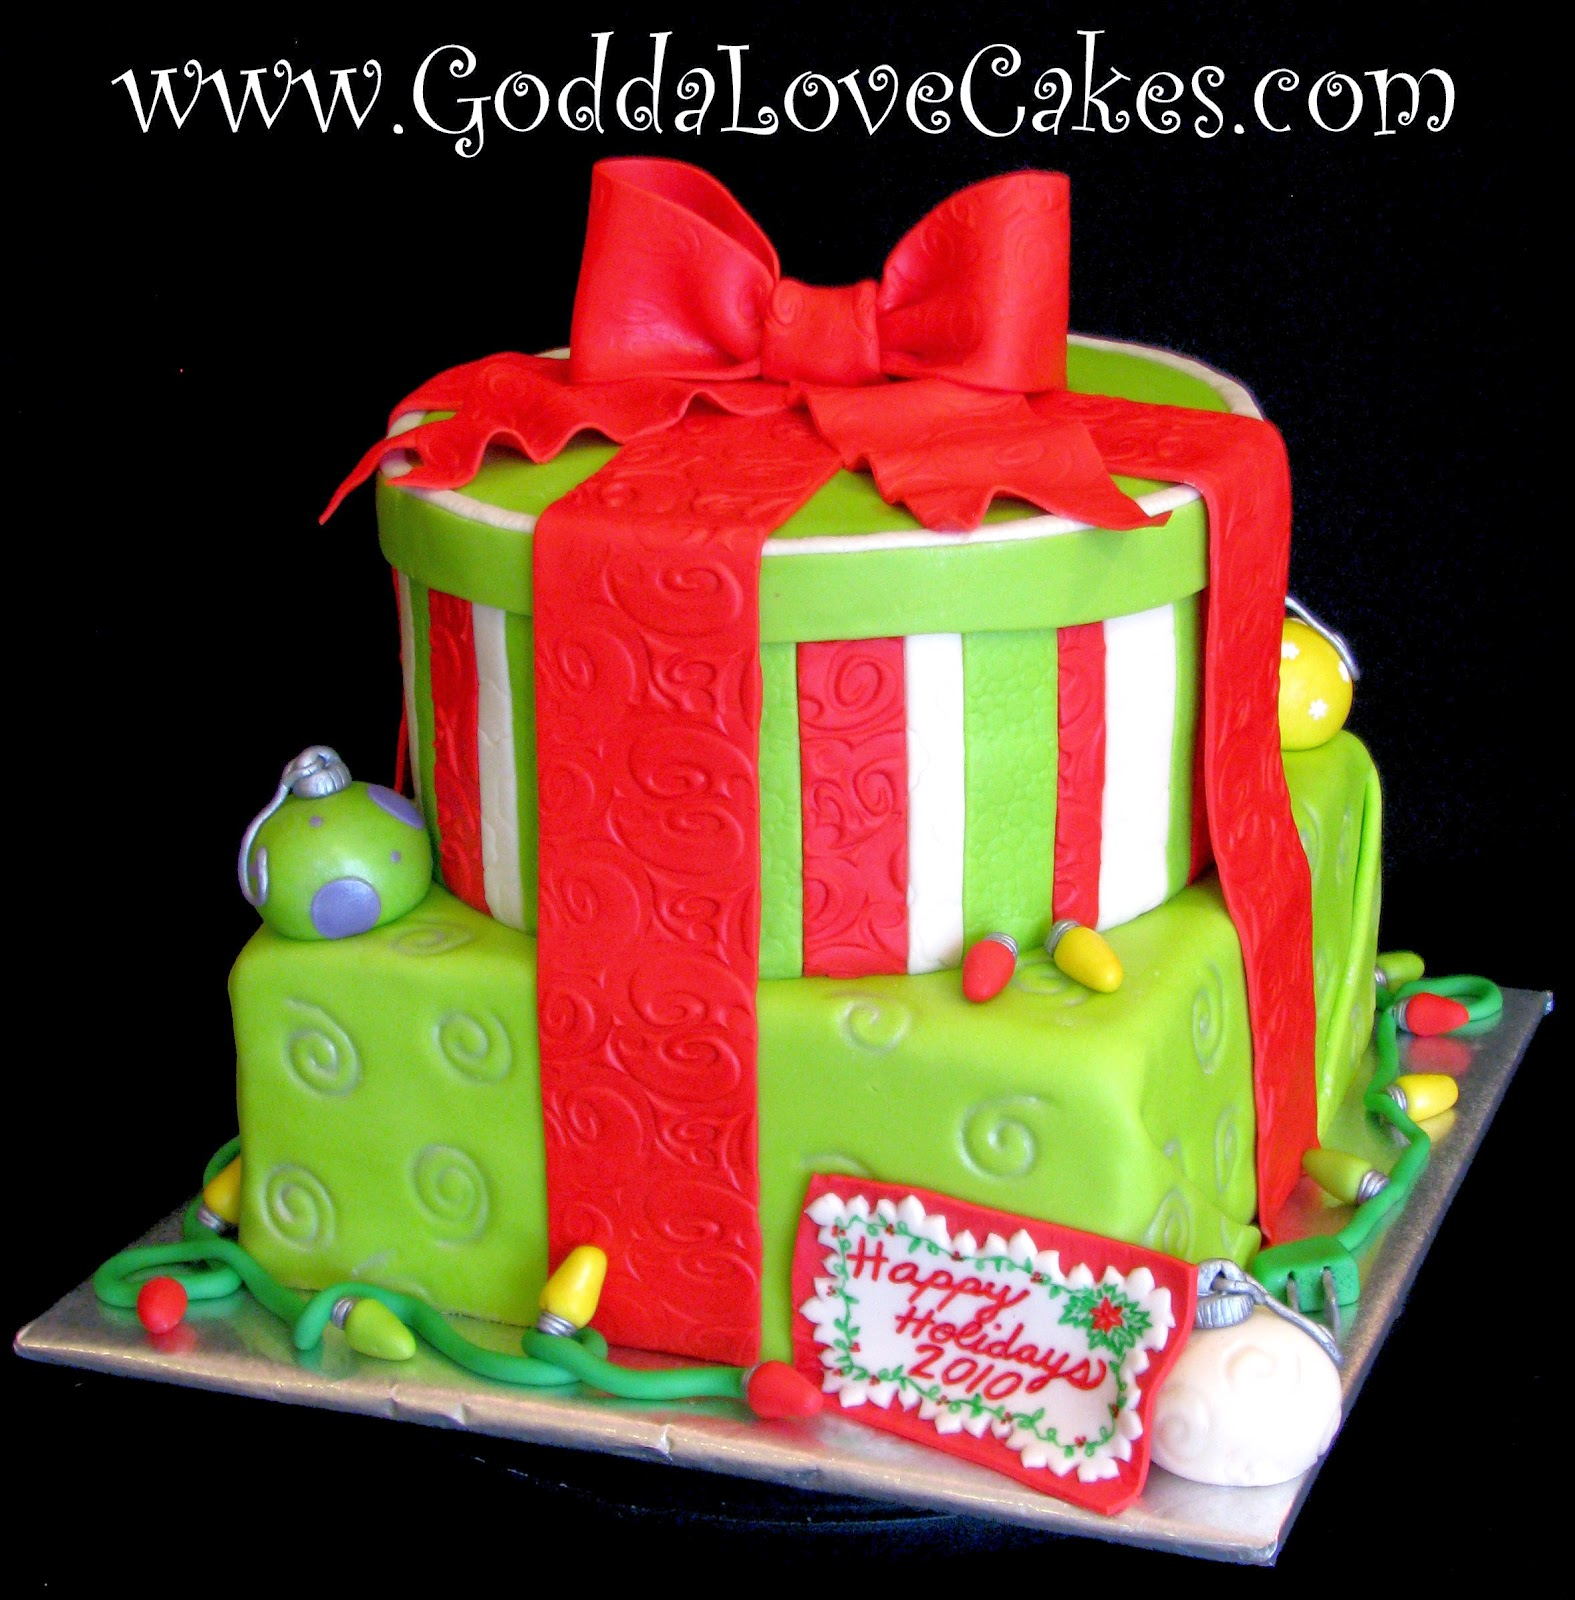 Christmas Cake Ideas Presents : Christmas Present Cake Godda Love Cakes